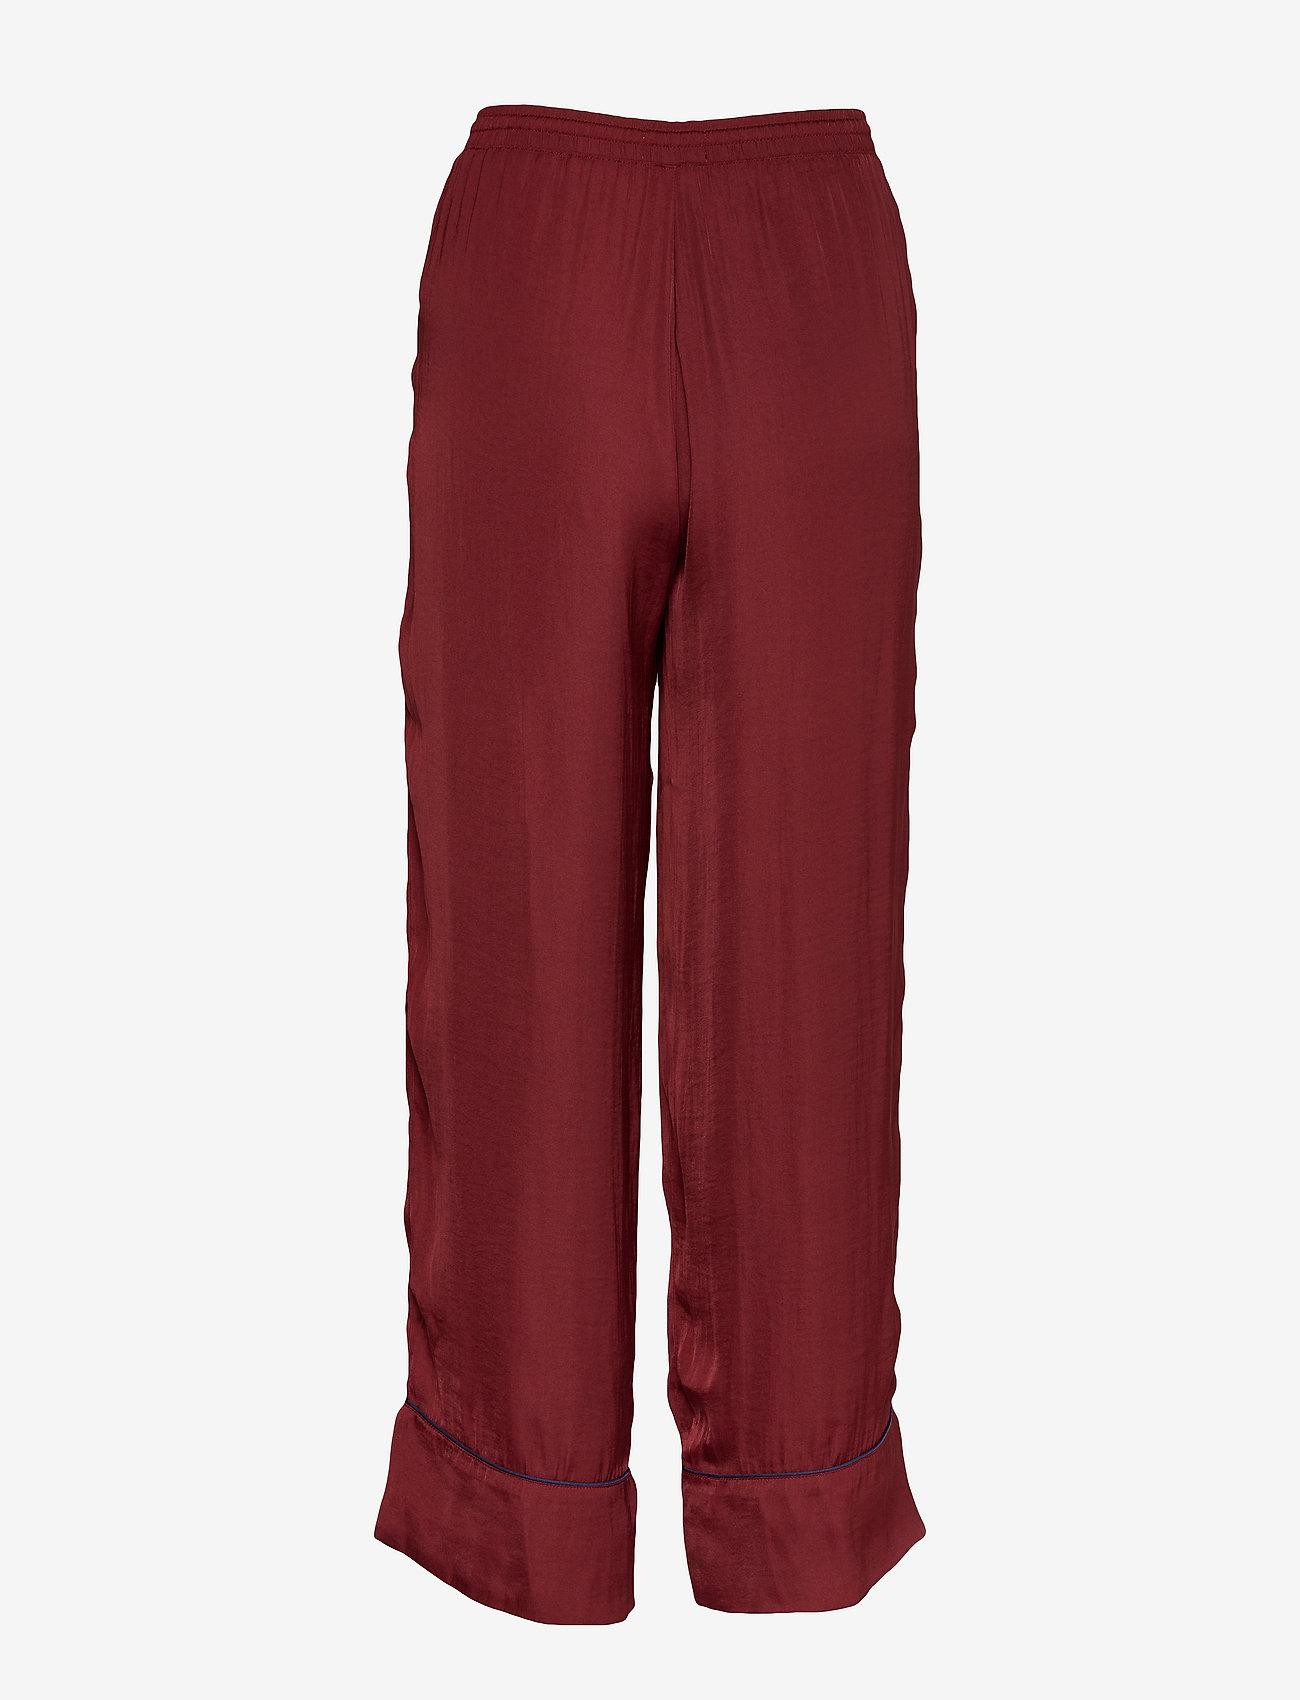 Dreamwell Satin Crop Pants (Carmenere 525) - GAP Lp8sk1